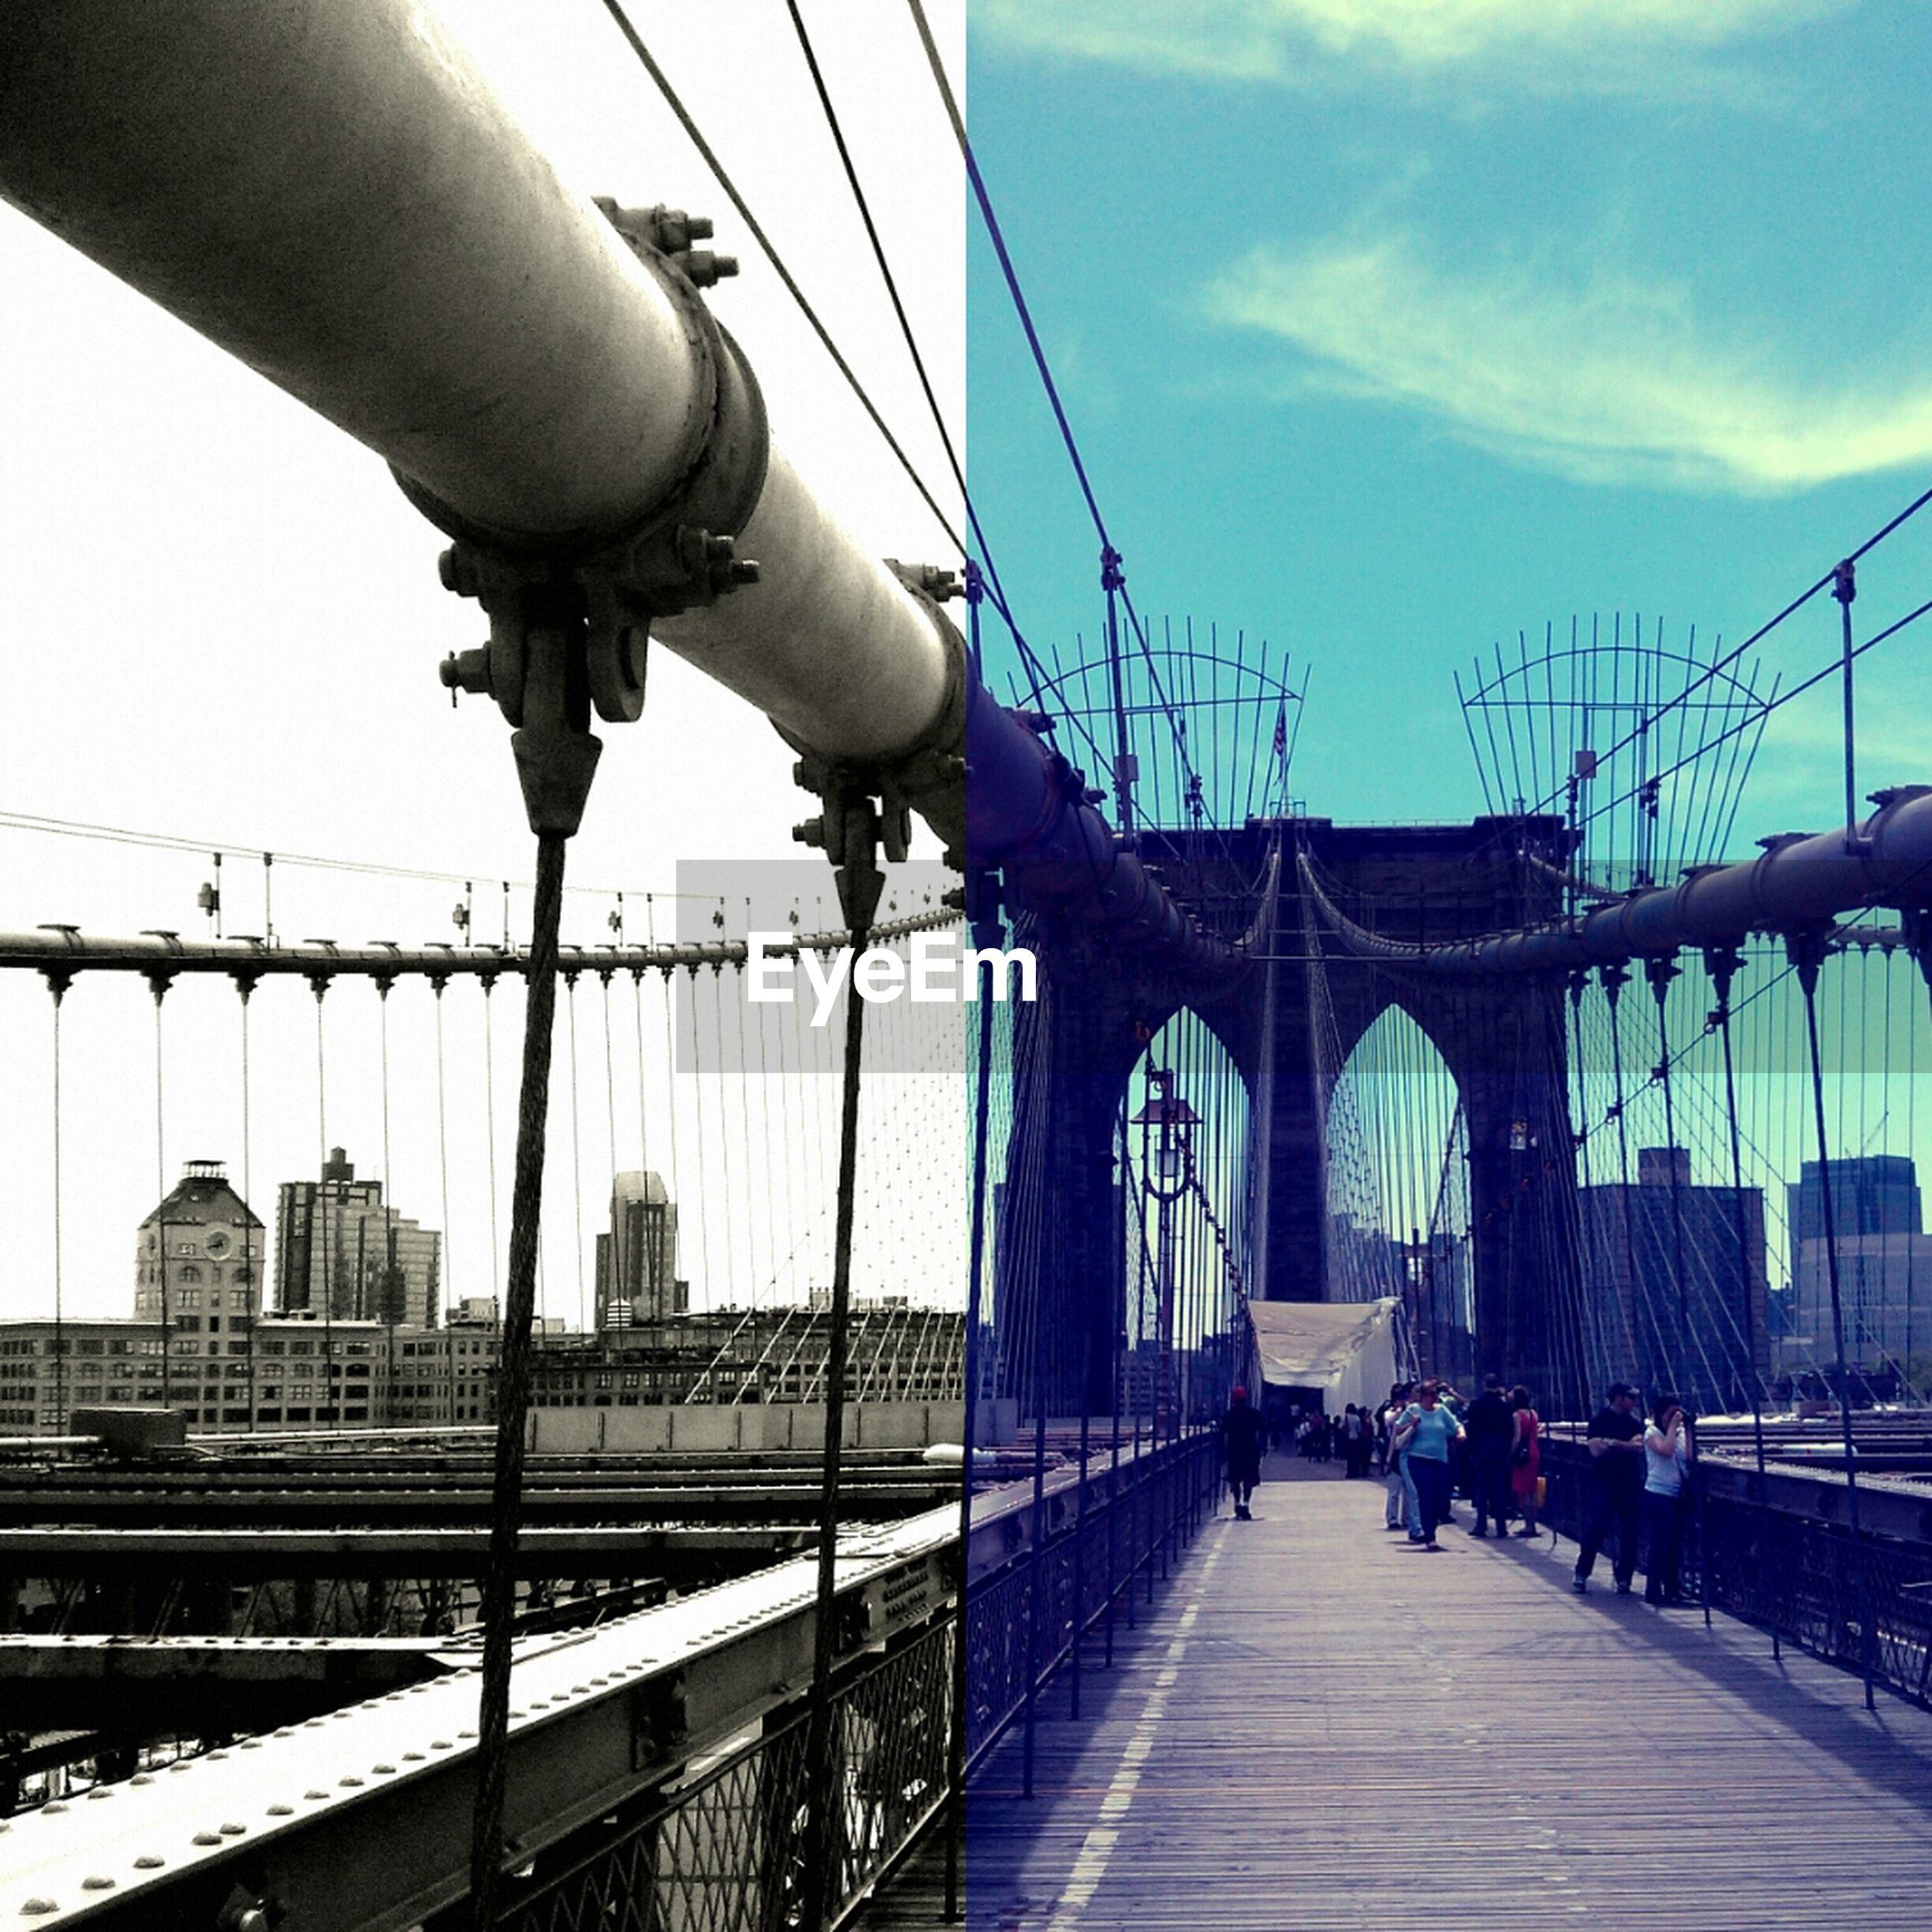 Digital composite image of people walking on suspension bridge